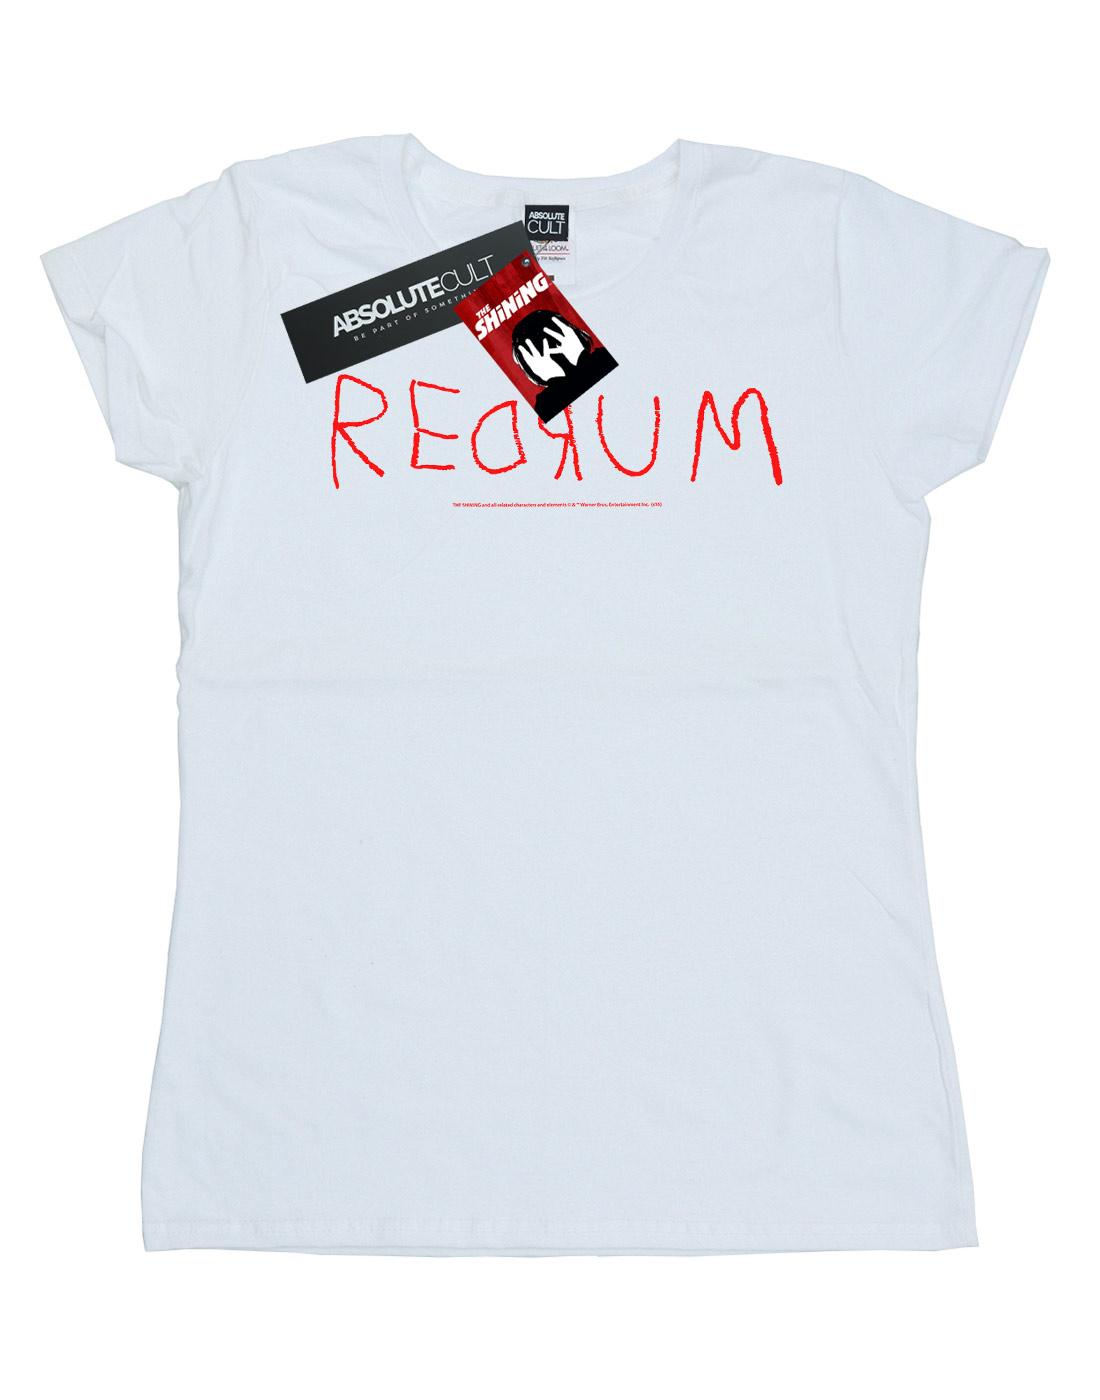 The-Shining-Women-039-s-Redrum-Text-T-Shirt thumbnail 11